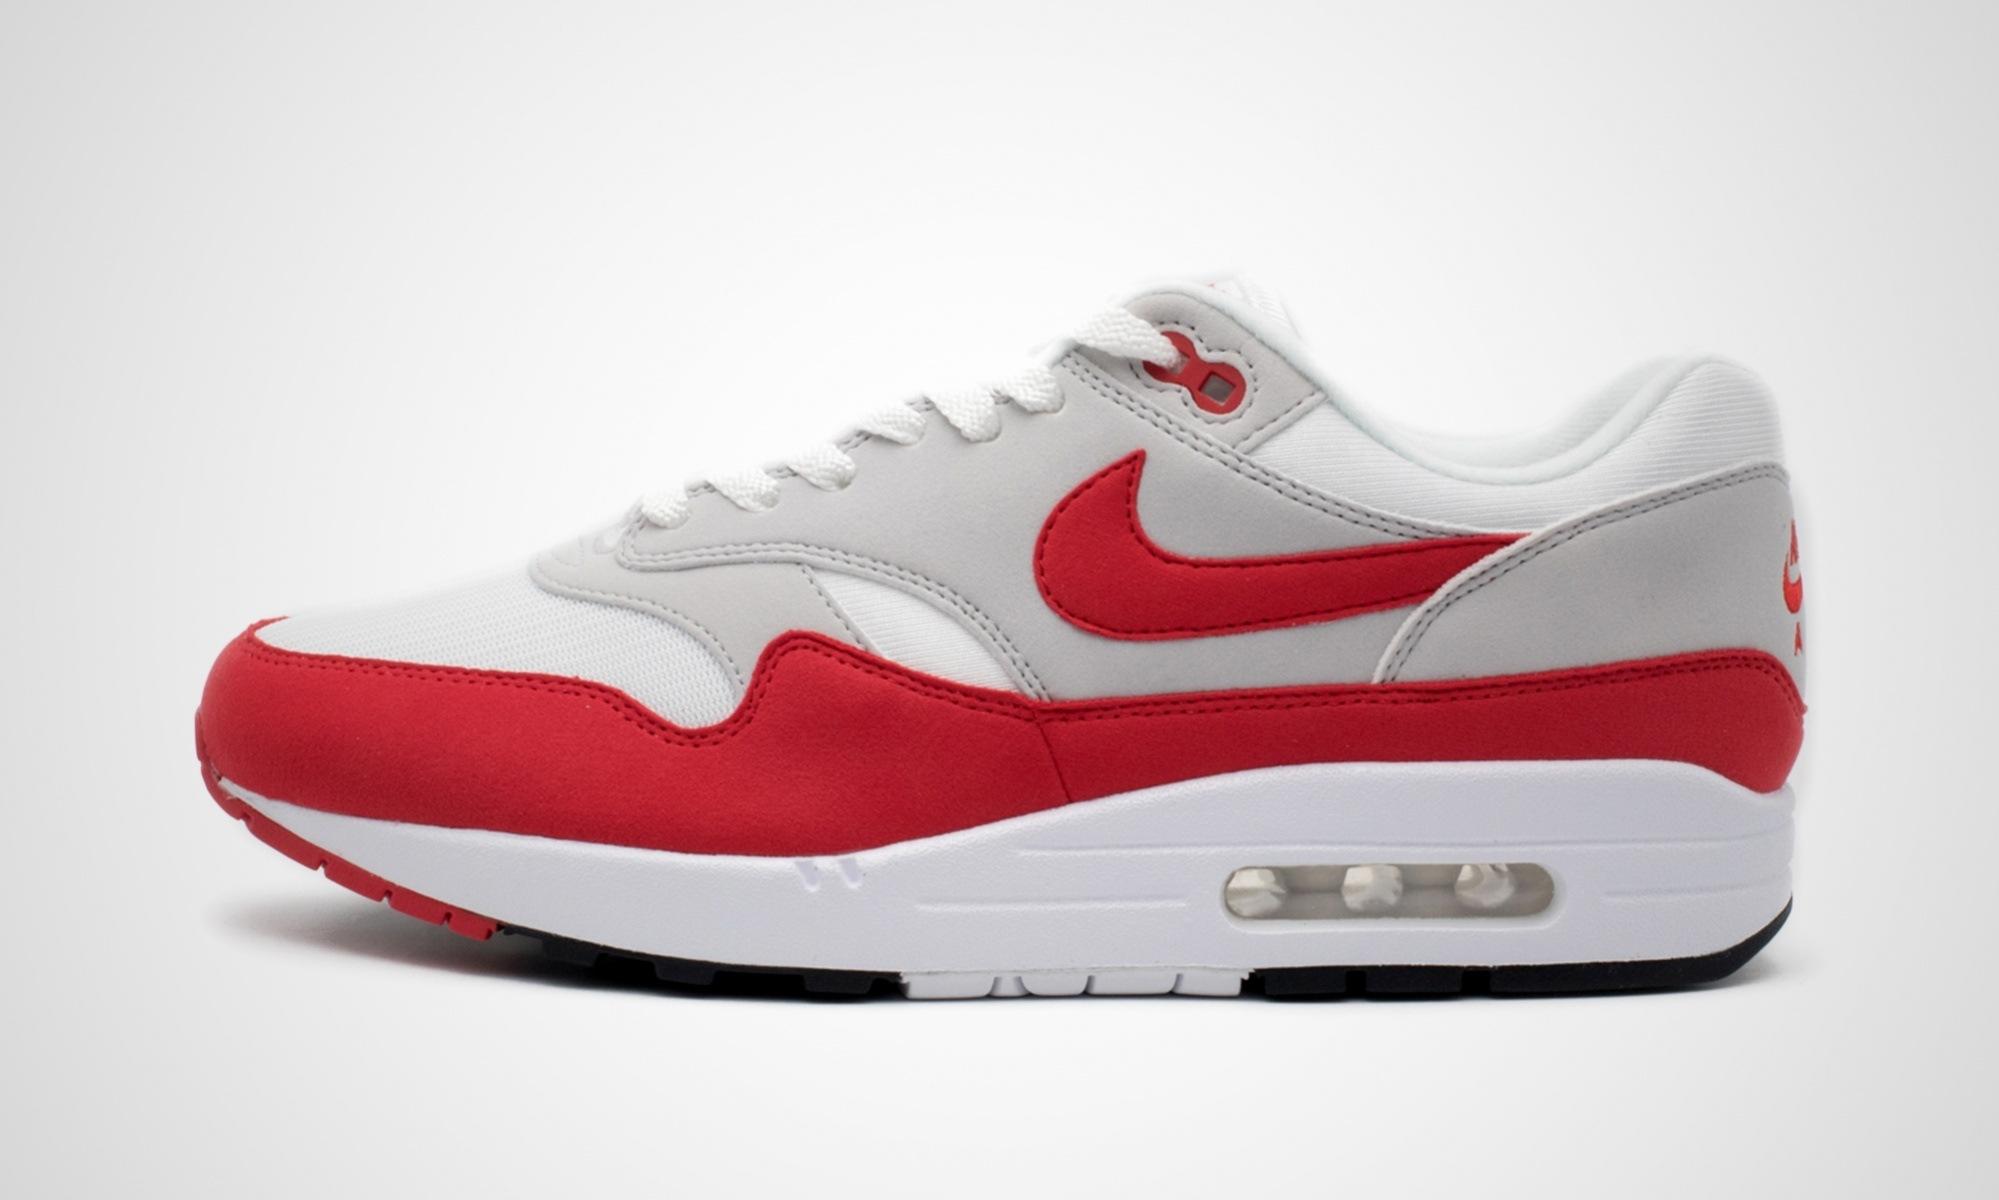 Nike Air Max 1 Anniversary OG Red